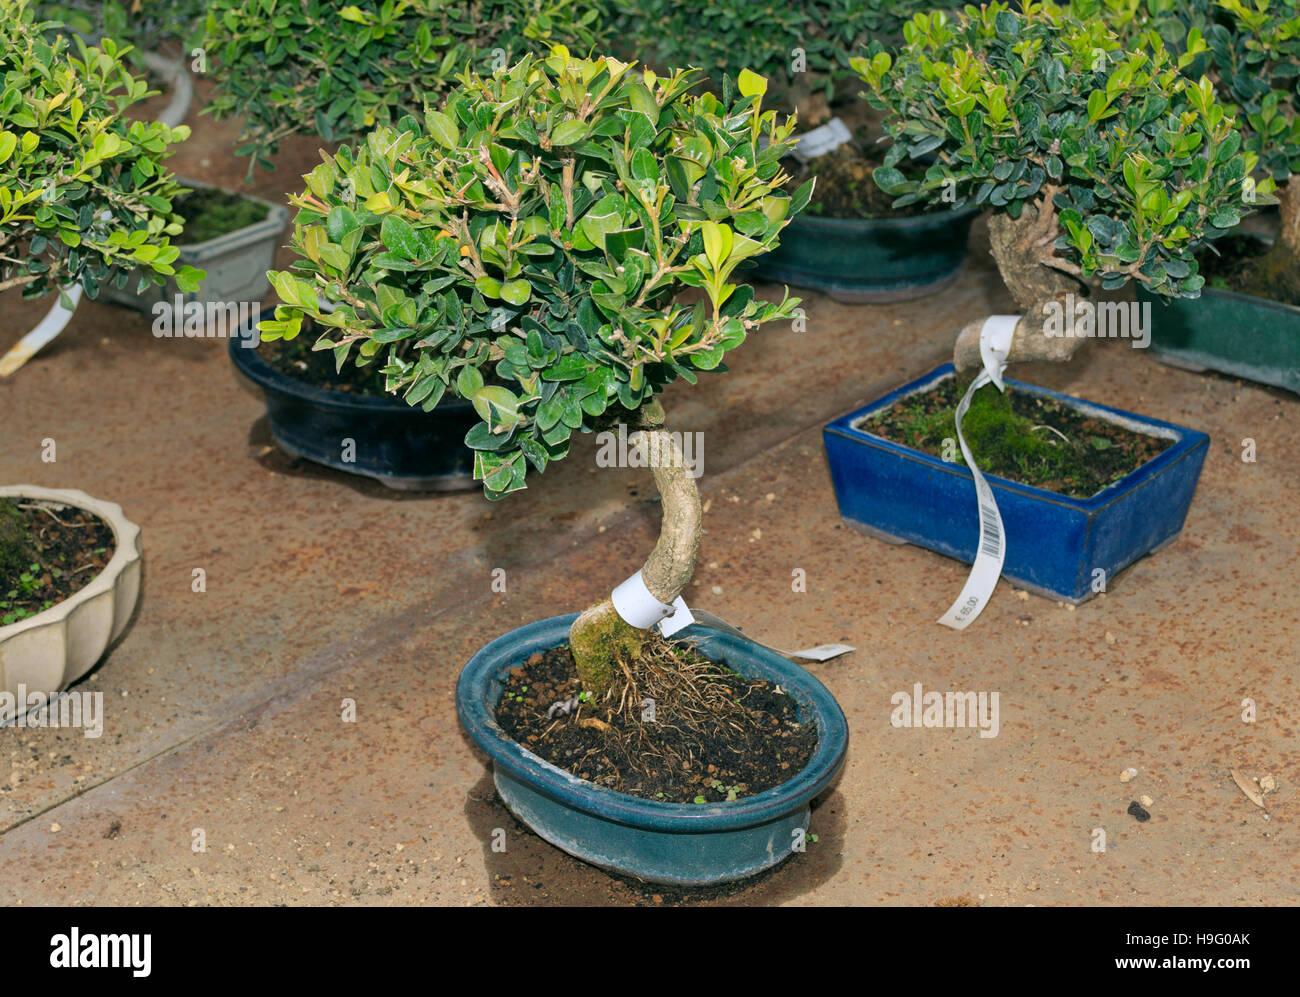 Boxwood Buxus Sempervirens Bonsai Plants For Sale Stock Photo Alamy